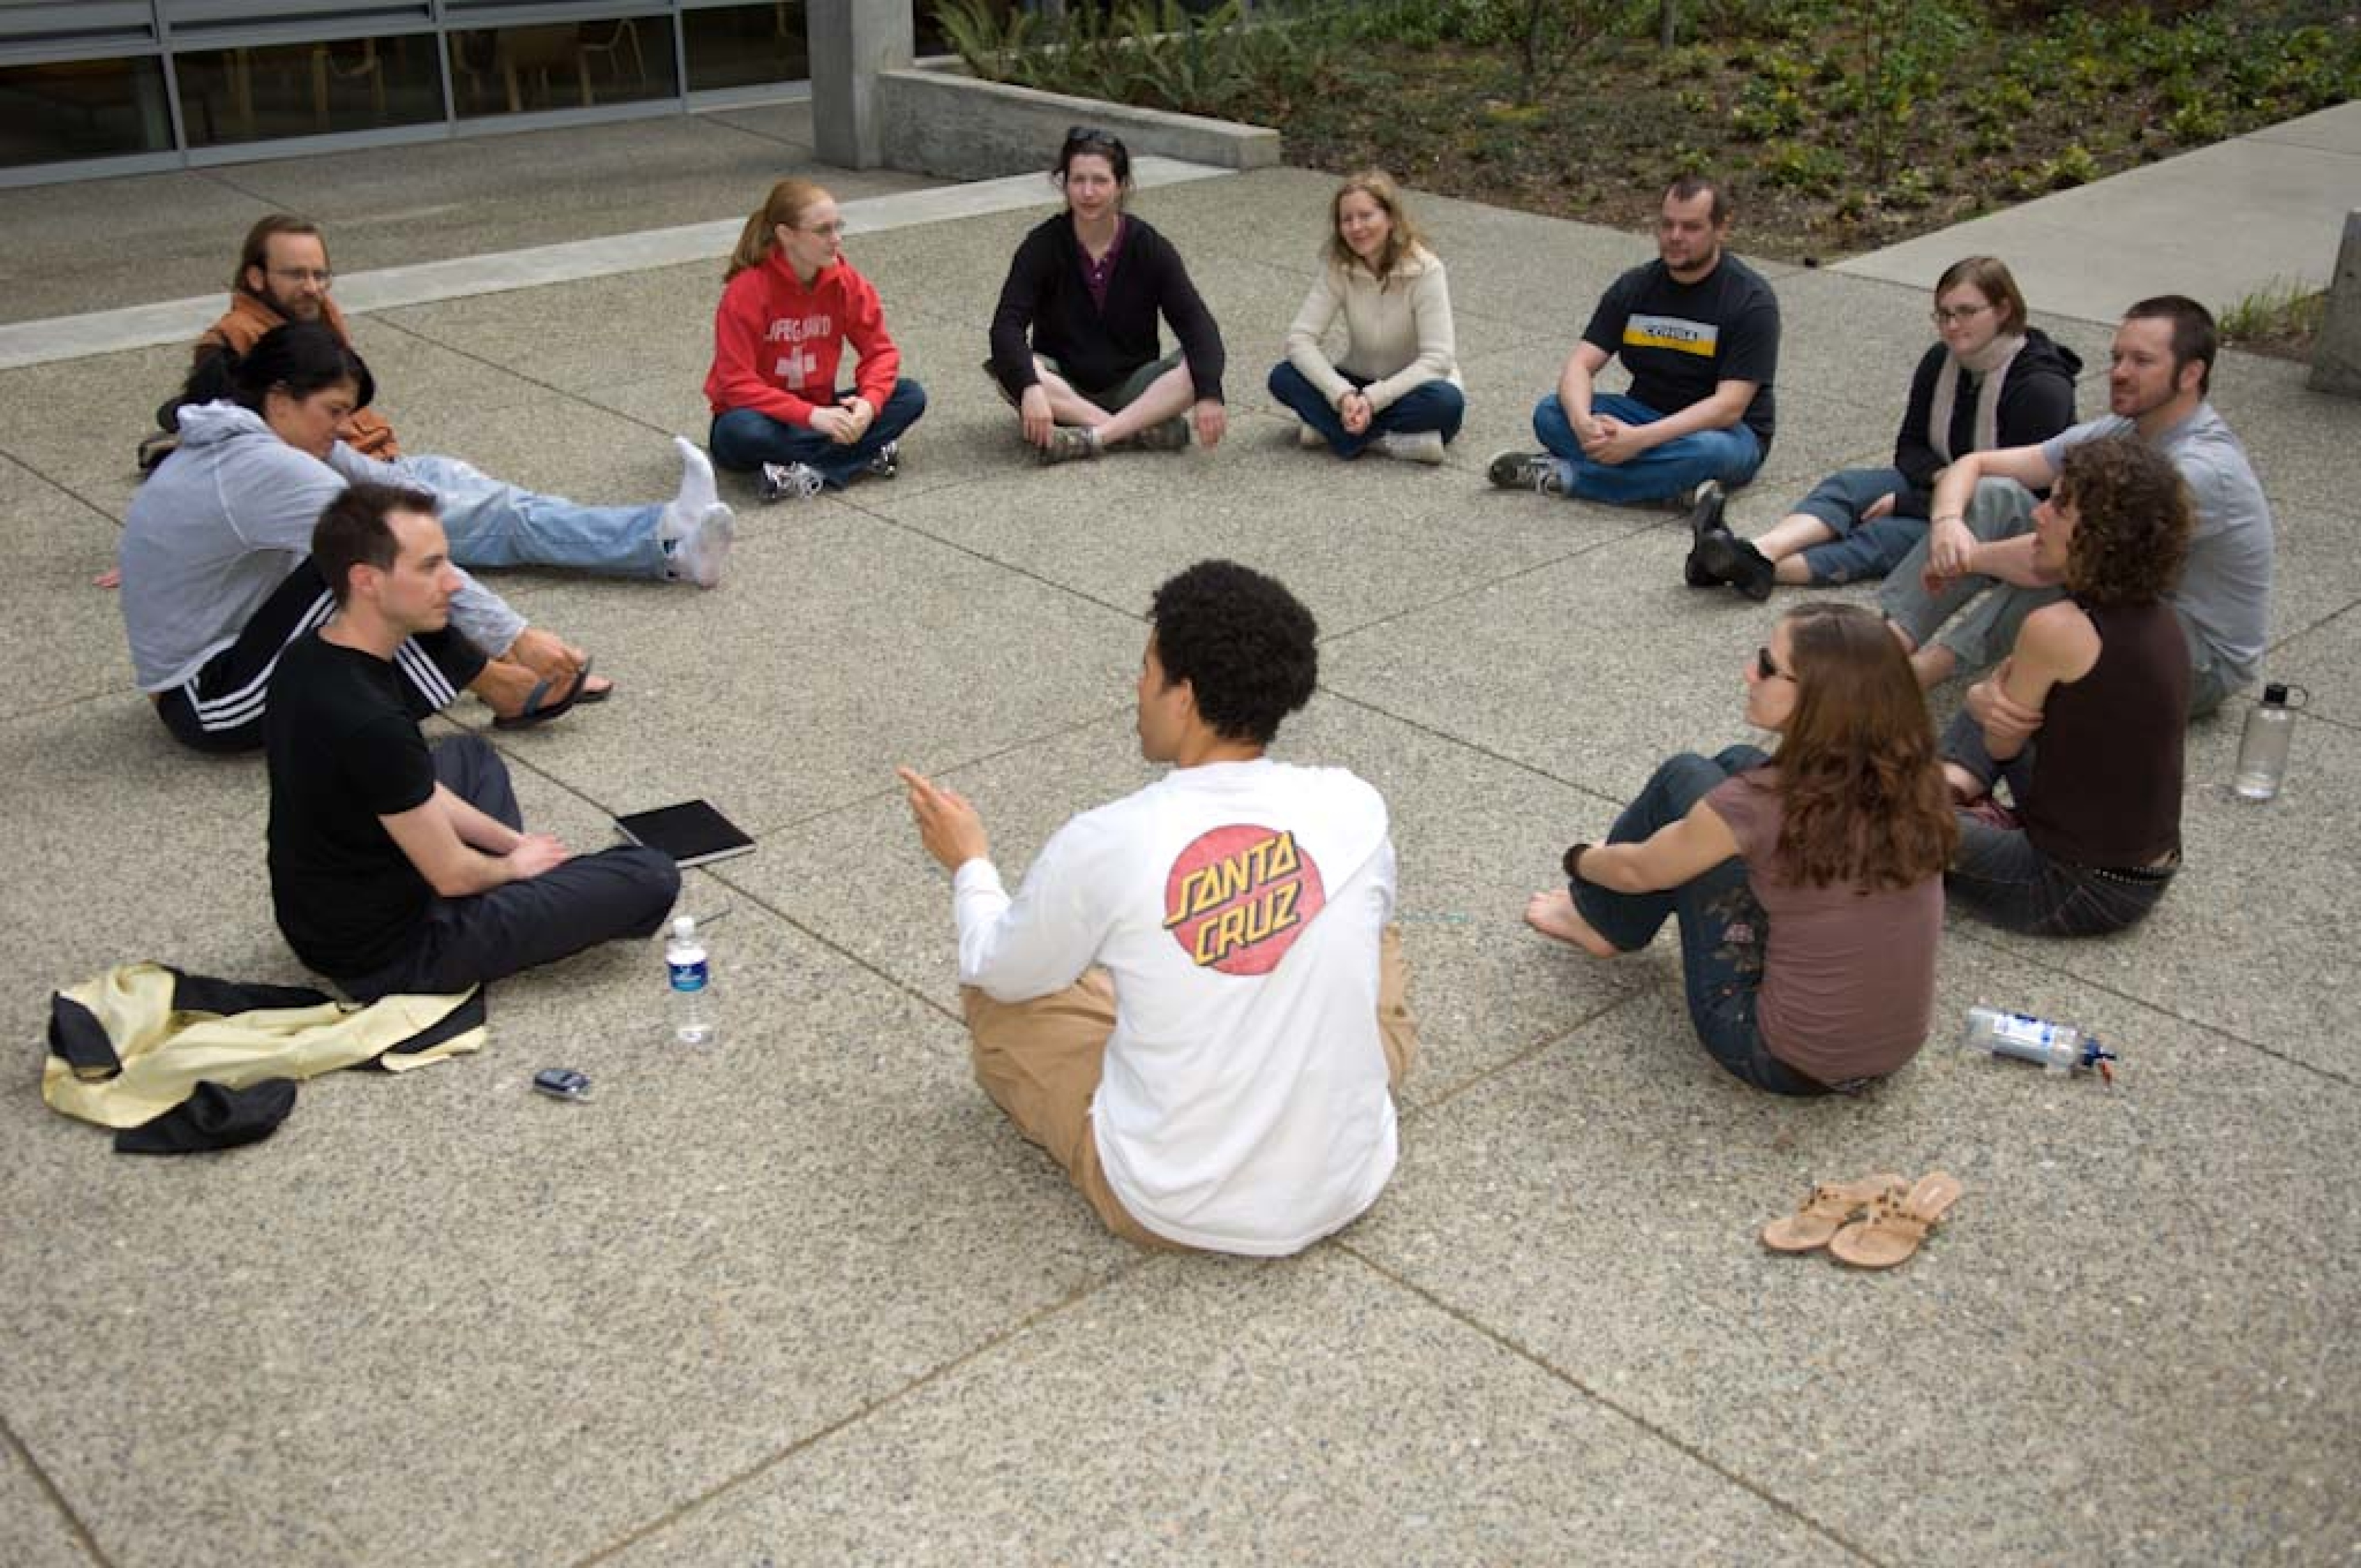 Outdoor Group Circle Talk